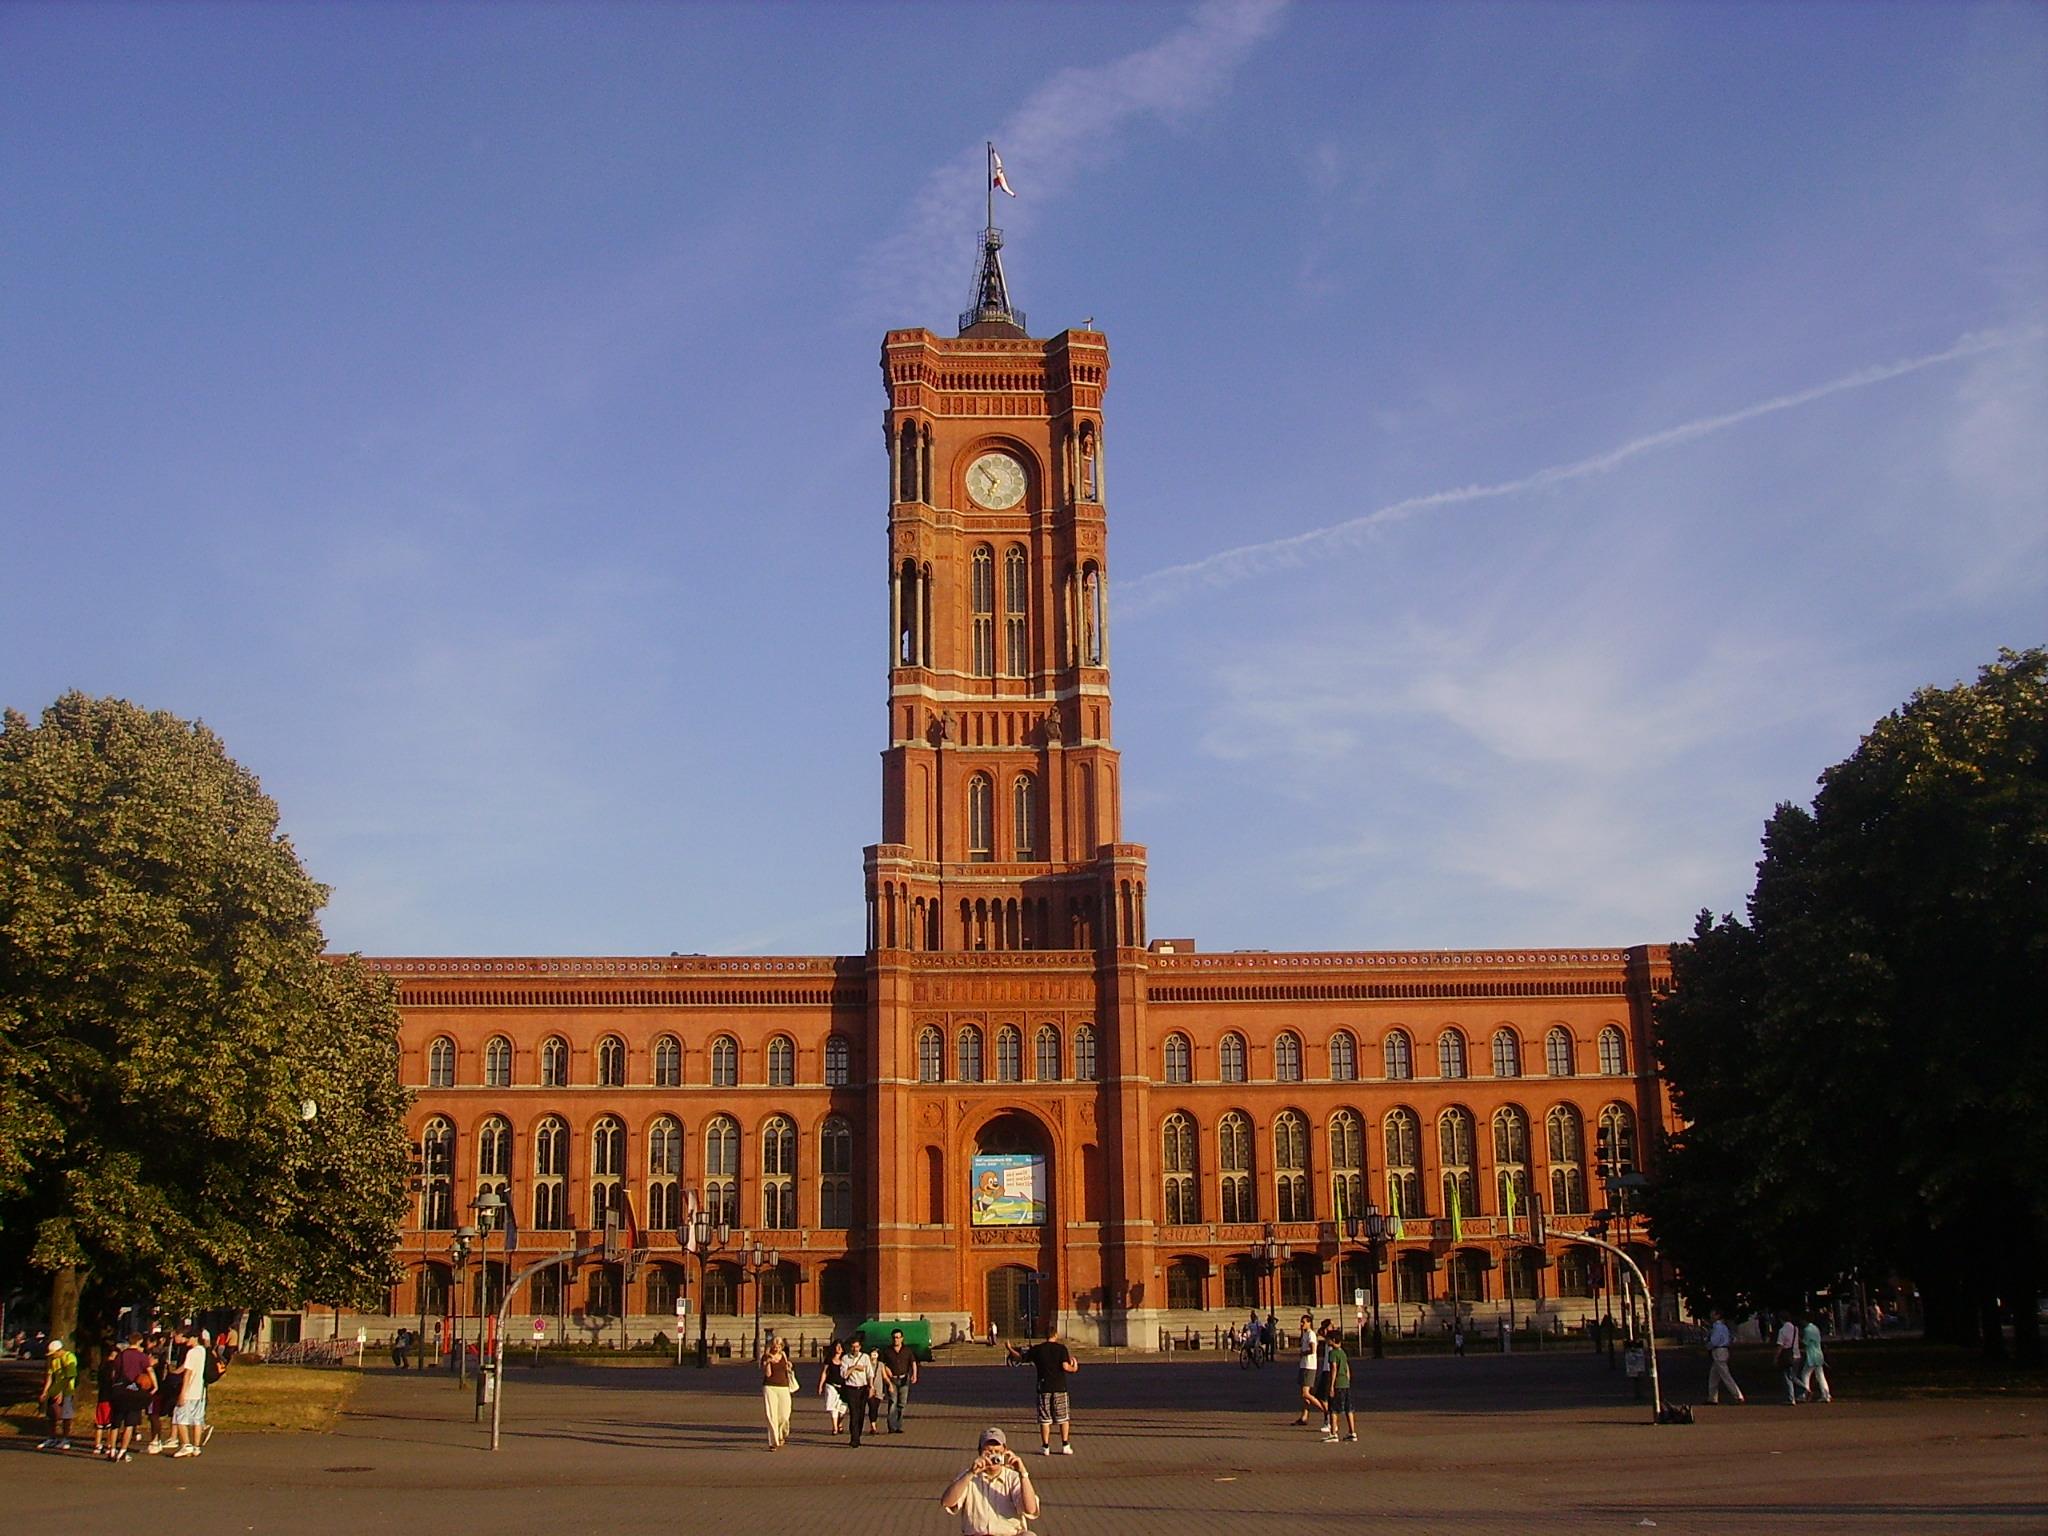 Rotes Rathaus in Mitte, Sitz des Berliner Senats